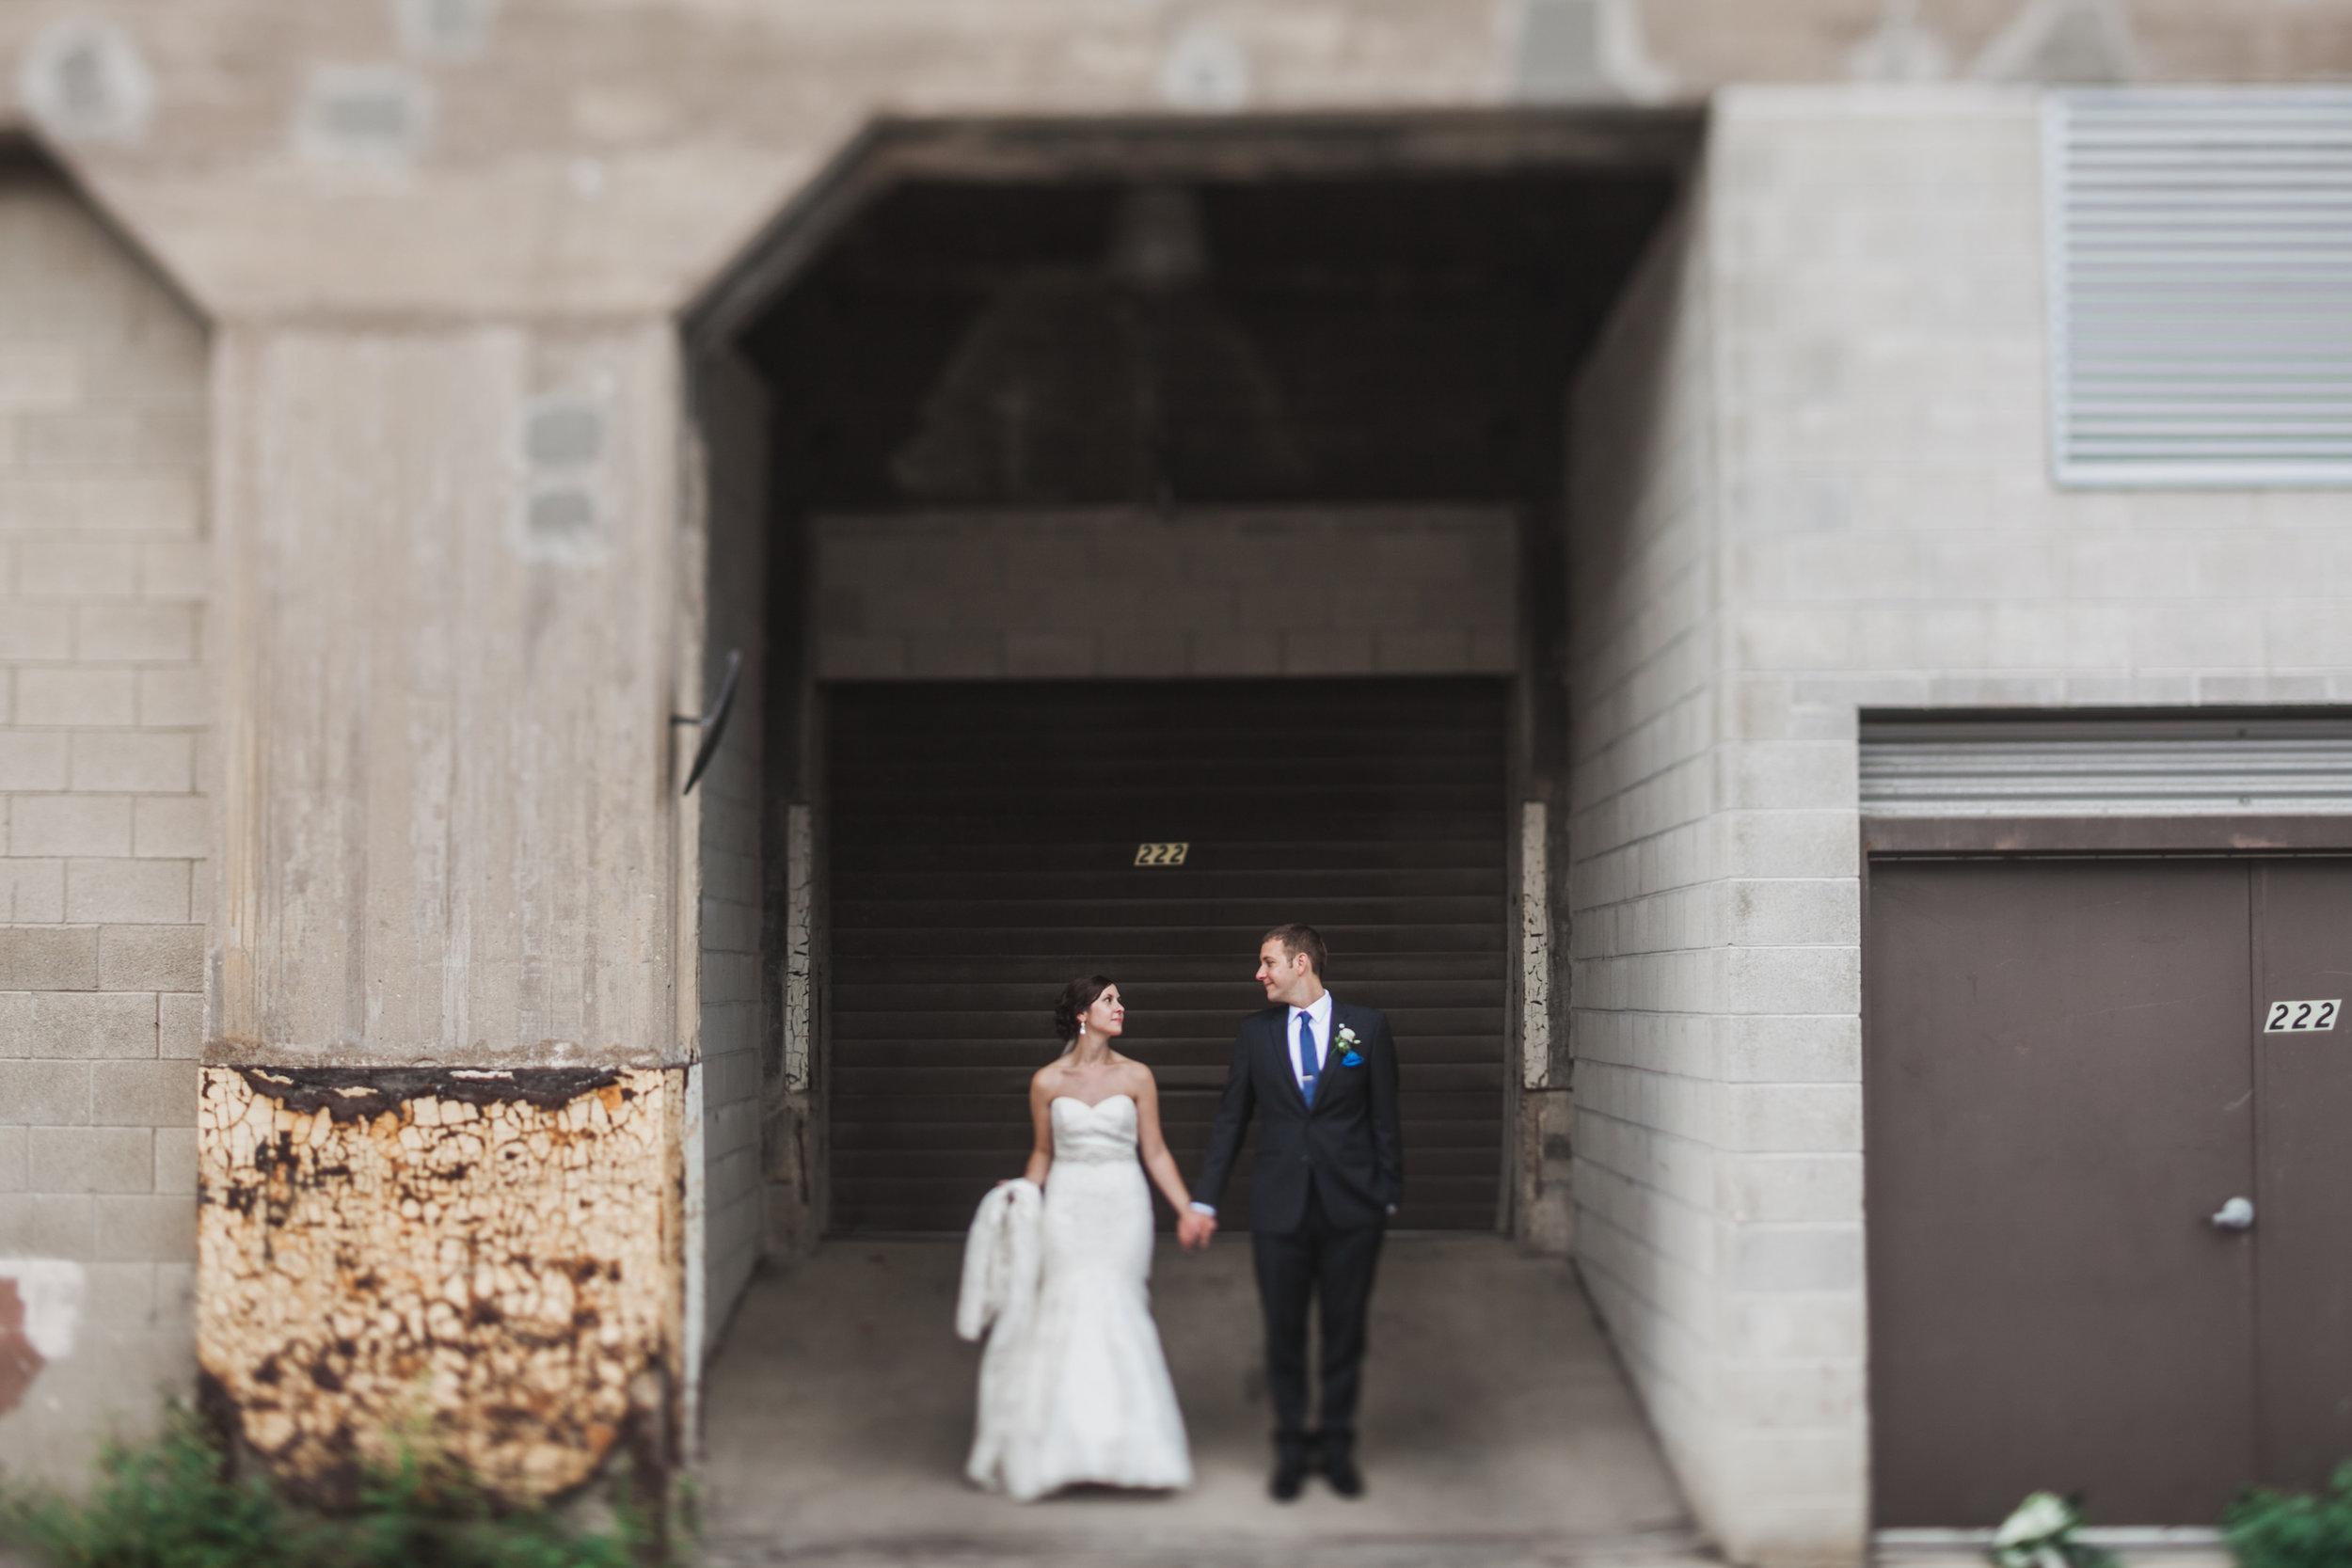 wisconsin-wedding-acowsay-uttke-photography-40.jpg